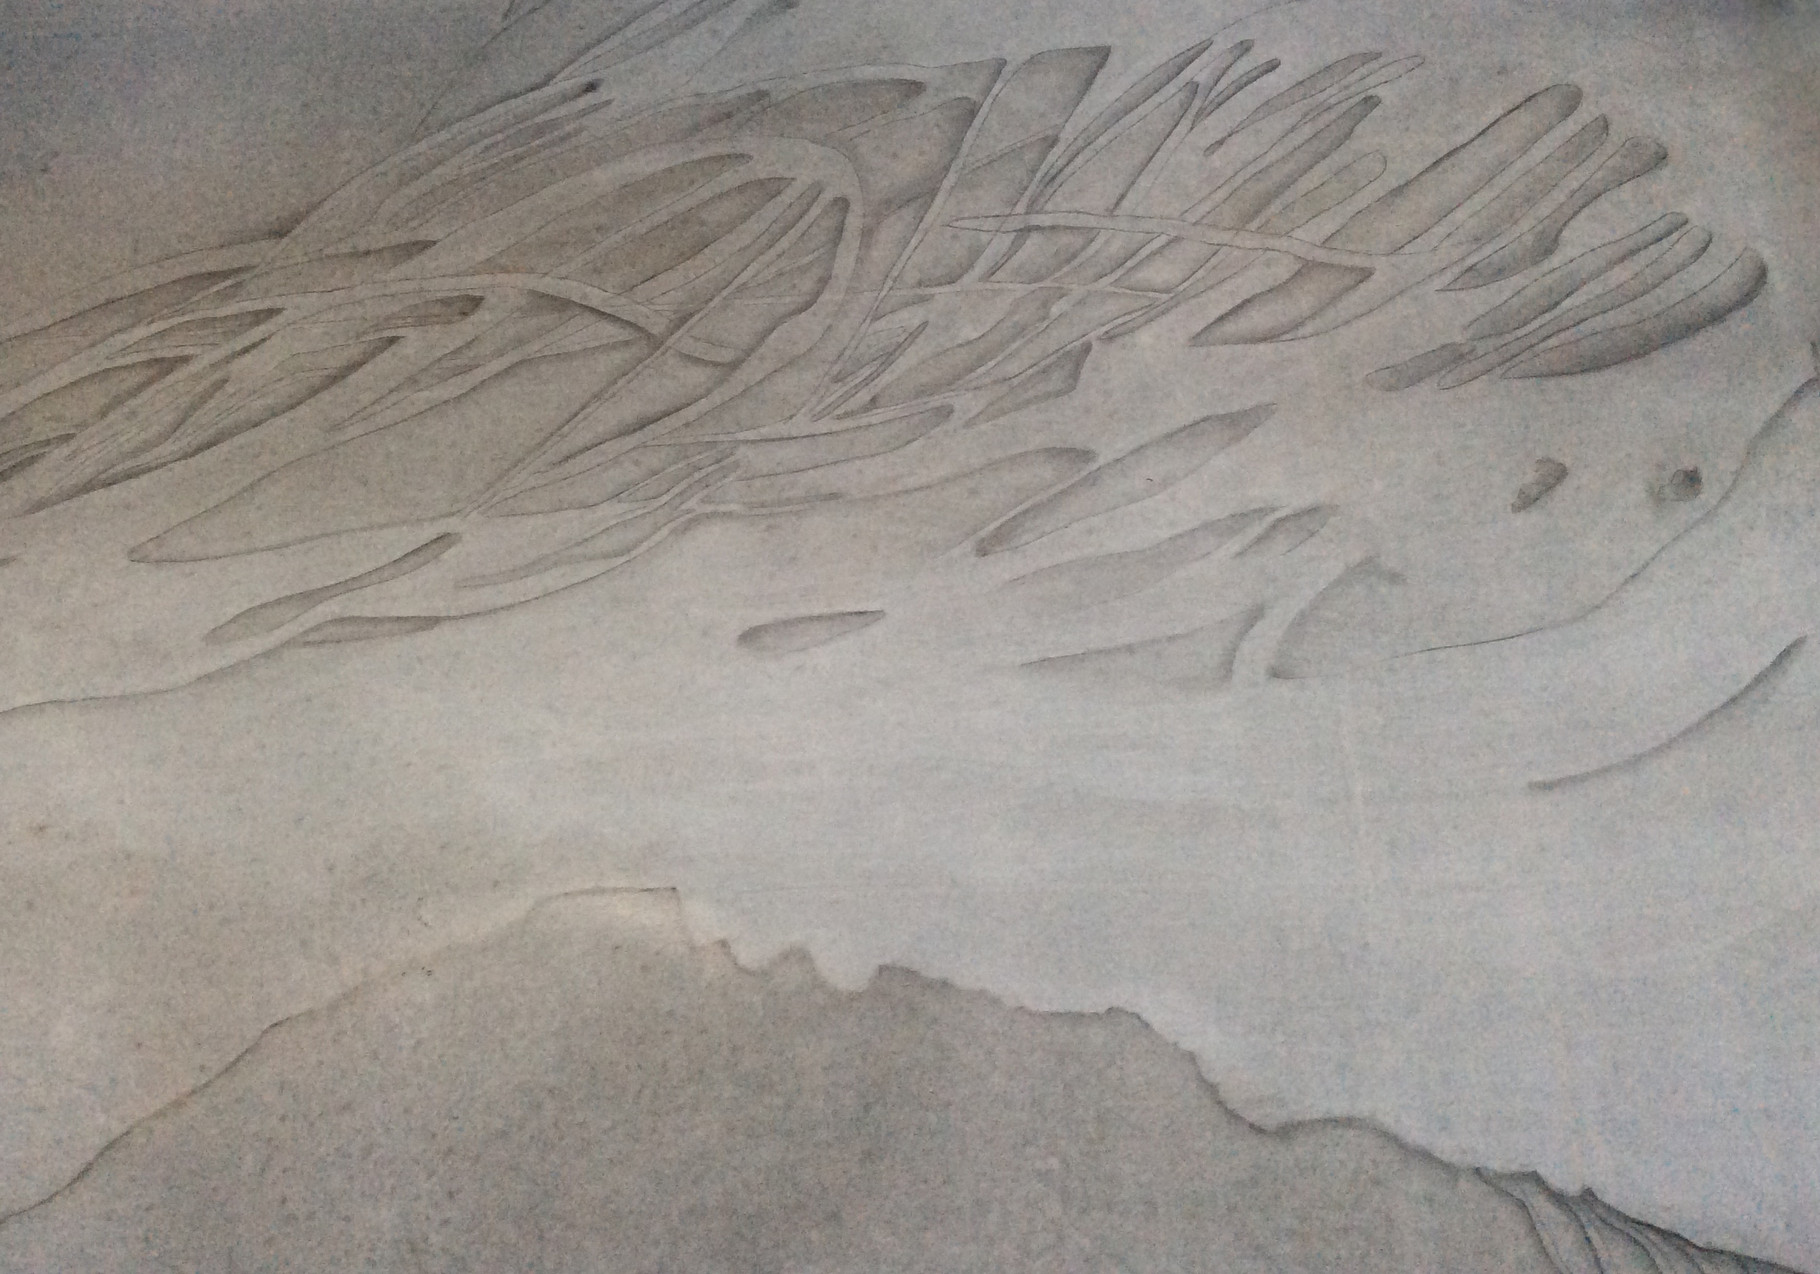 Wandmalerei im Eingangshalle